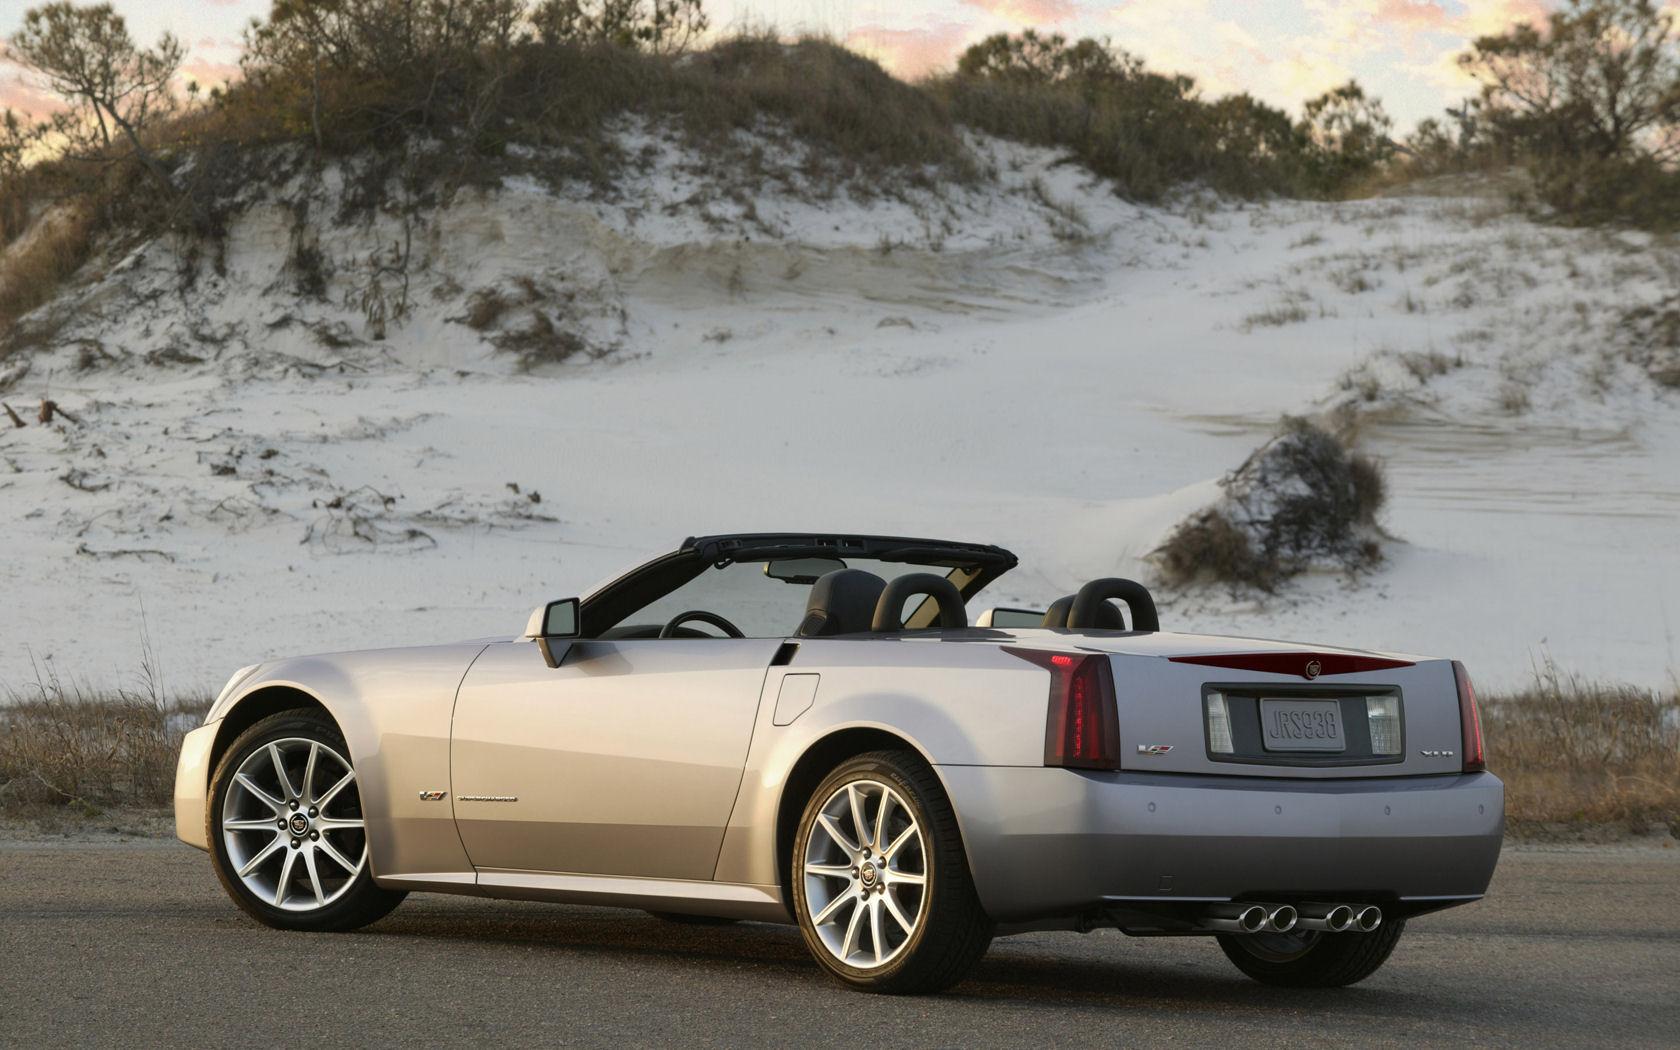 Cadillac Xlr Xlr V Supercharged Free Widescreen Wallpaper